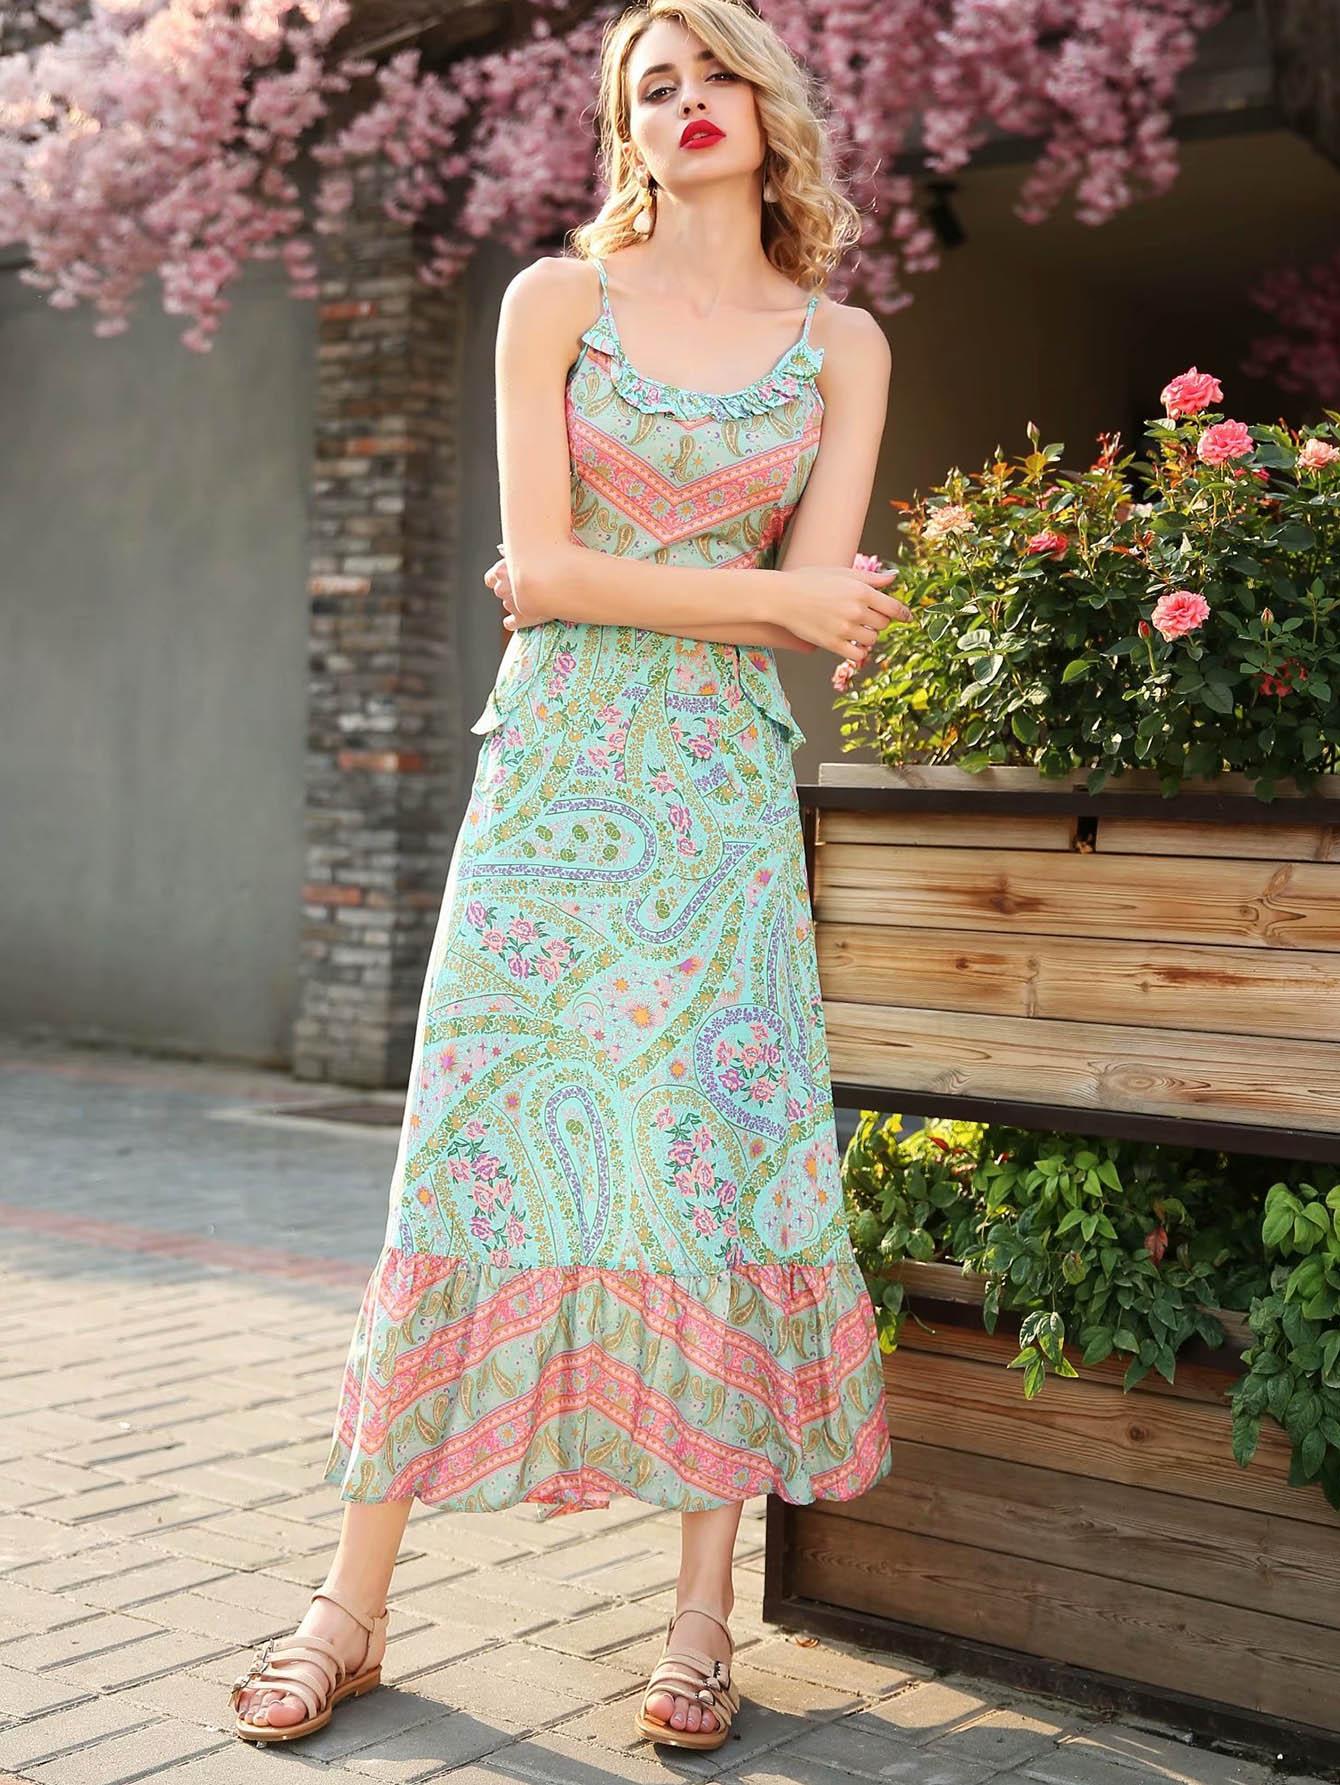 Calico Print Ruffle Hem Cami Dress calico print faux pearl detail cami dress